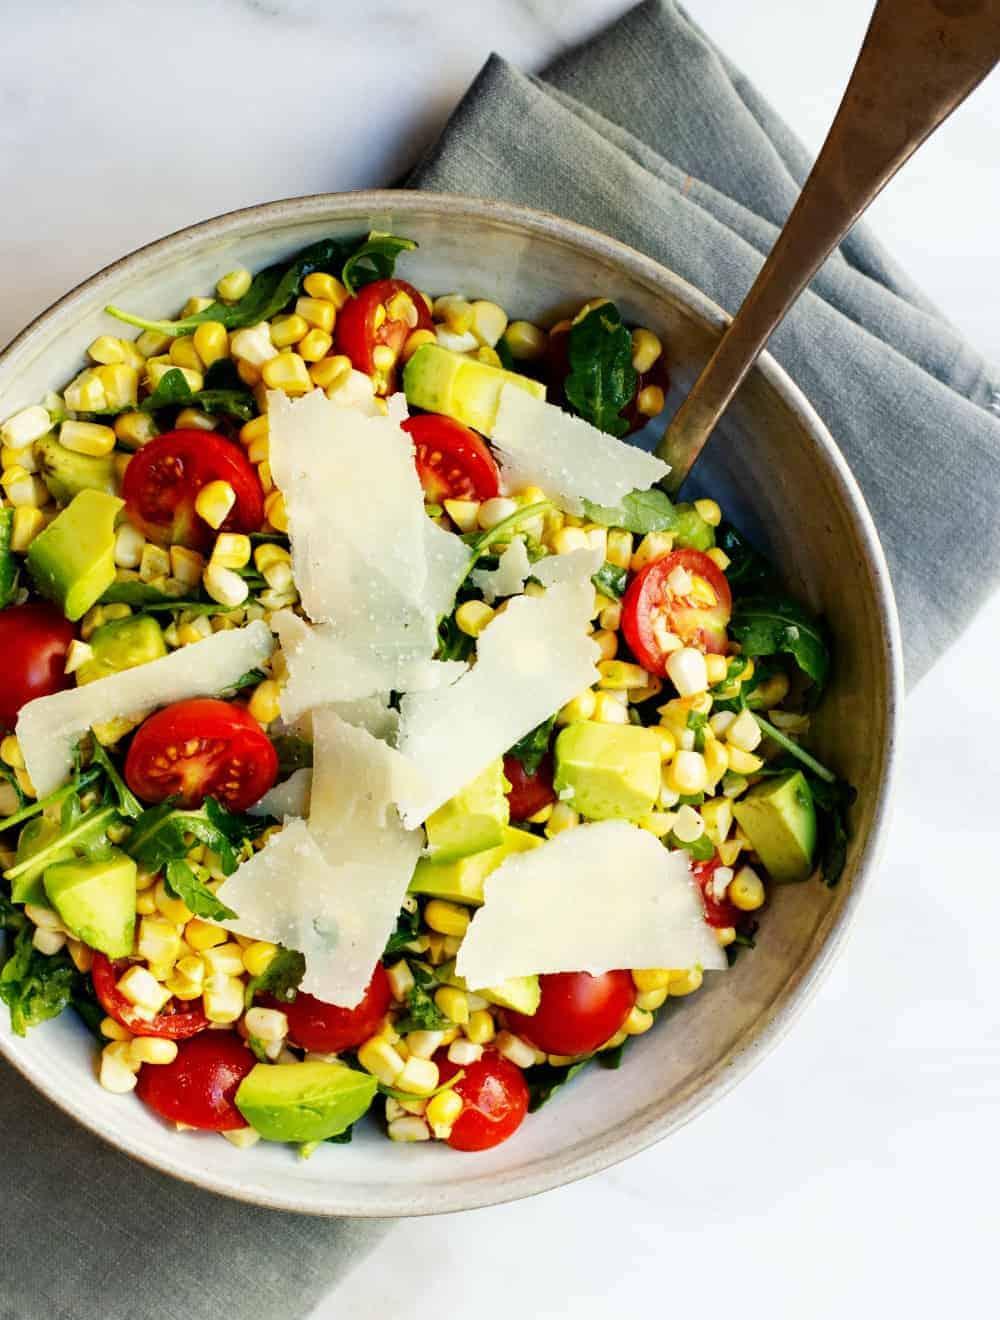 Corn Salad with Arugula served